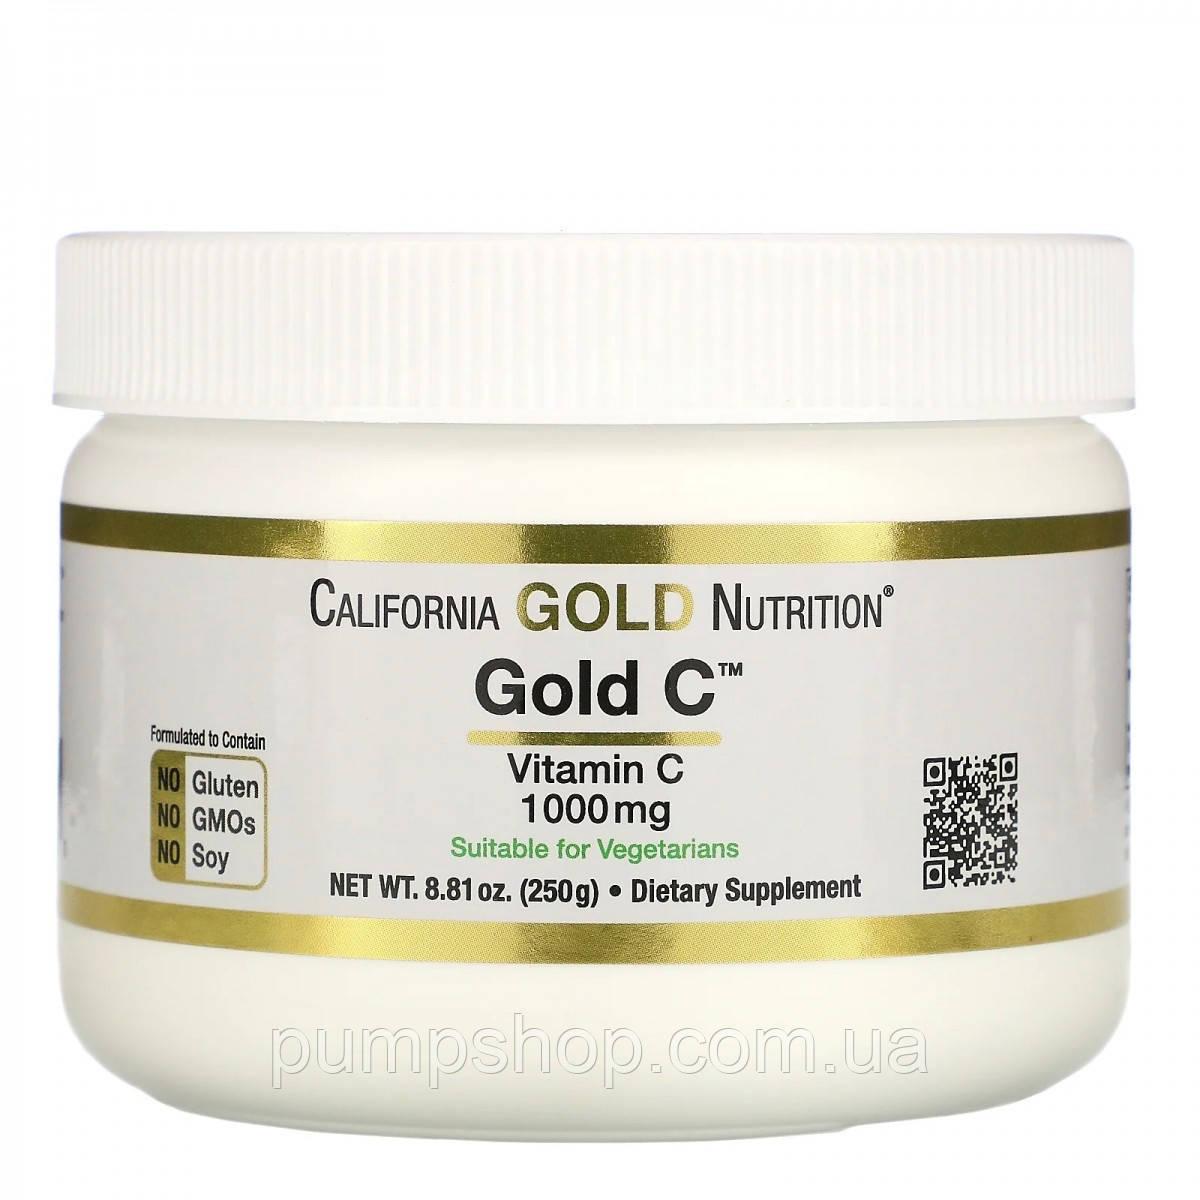 Вітамін C в порошку California Gold Nutrition Gold C 1000 мг 250 г